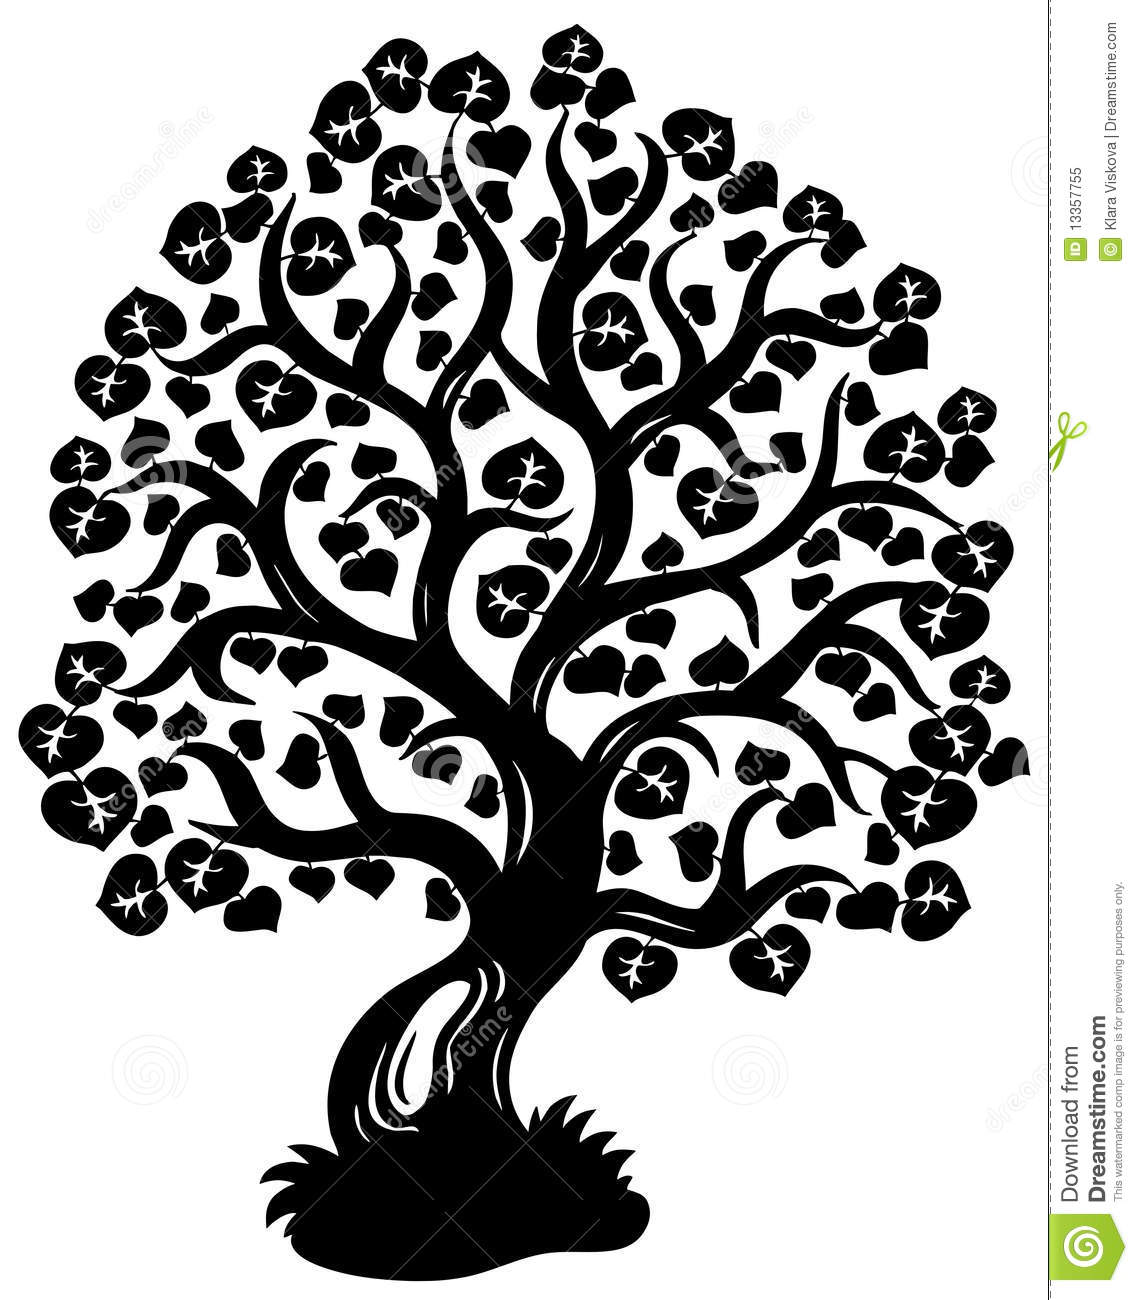 clip art tree silhouette - photo #36